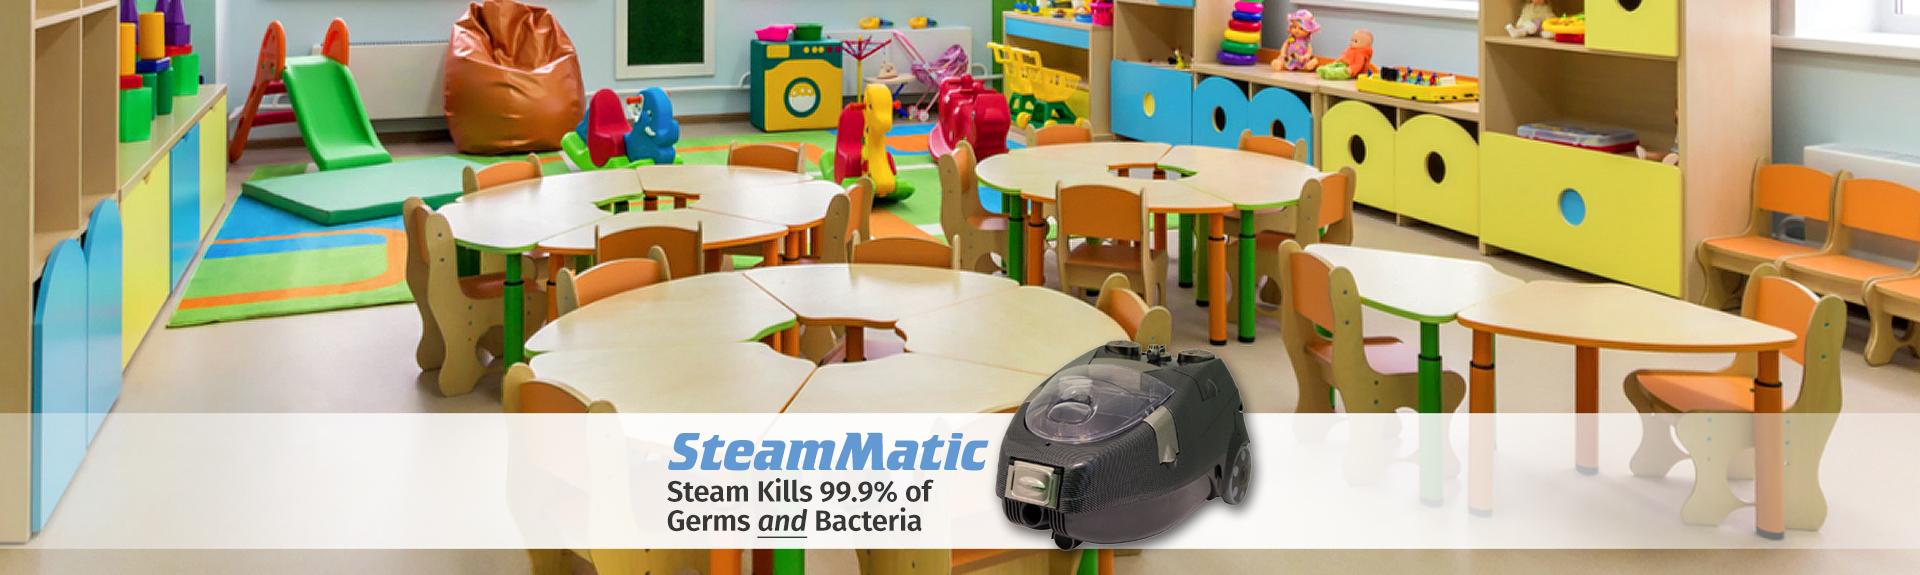 SteamMatic